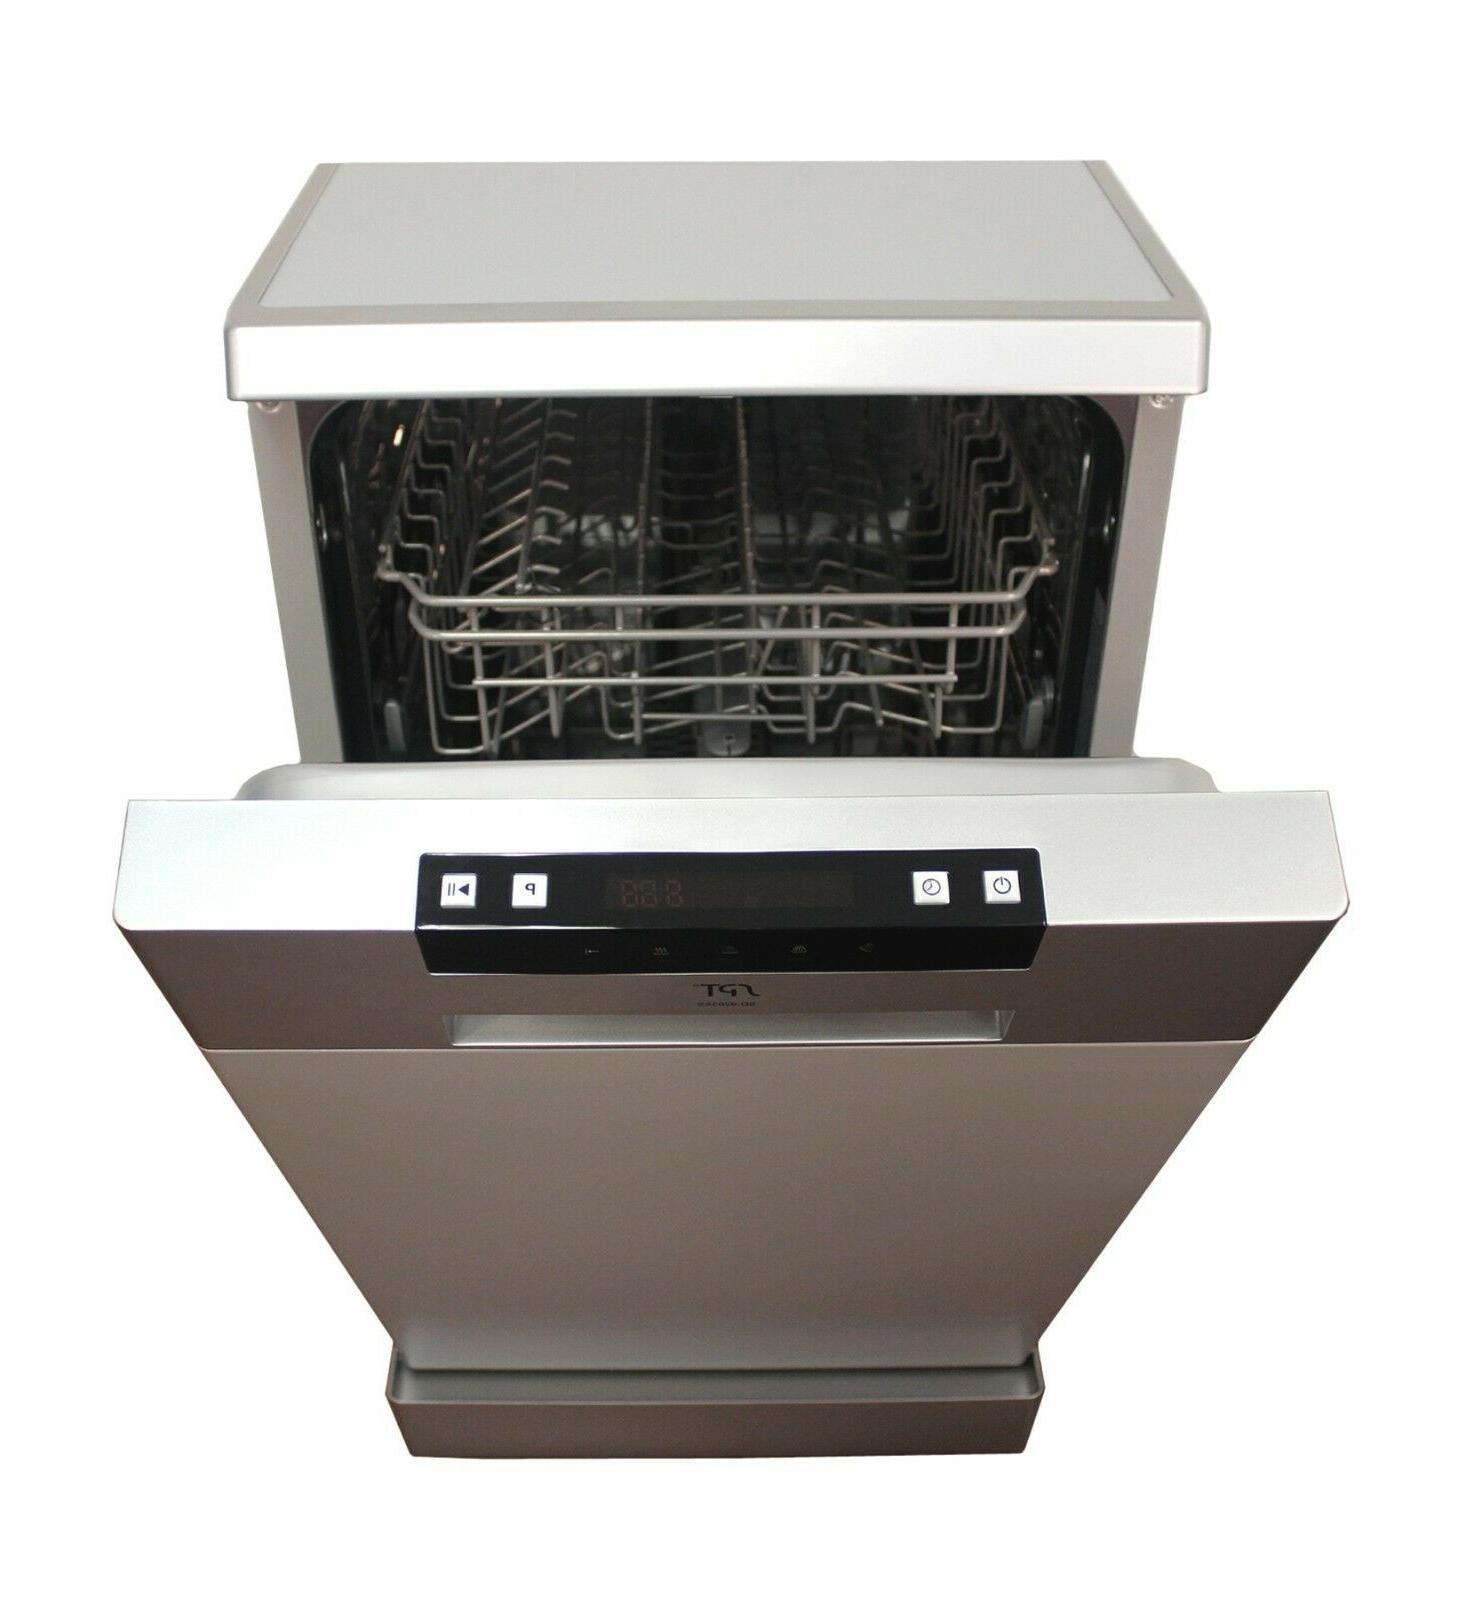 Sunpentown Portable Dishwasher-ENERGY STAR